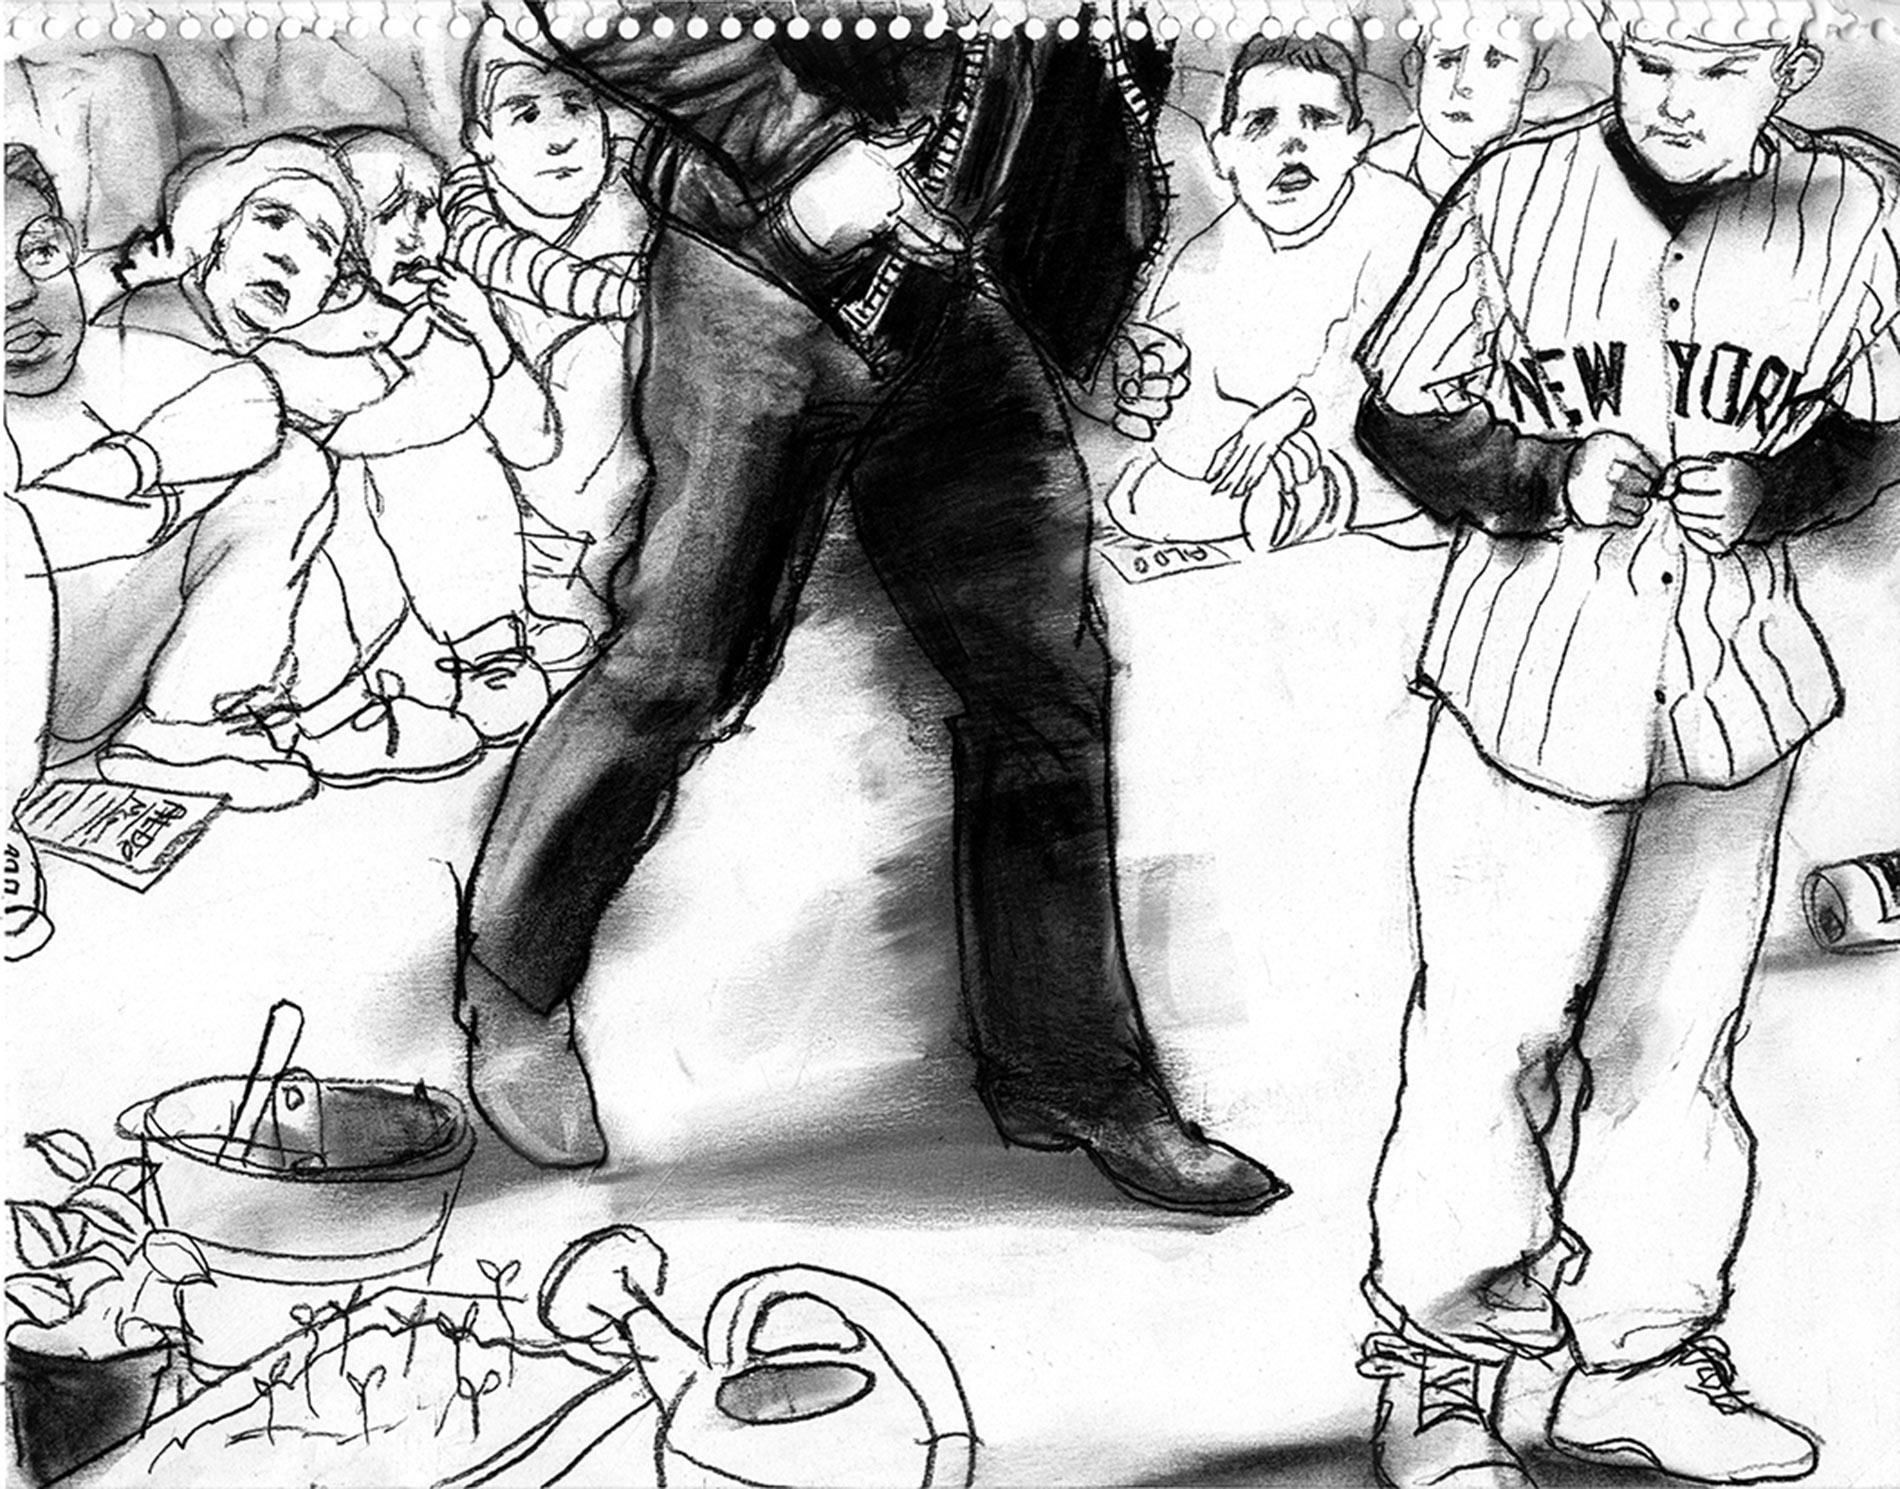 NYT-bad-guy-with-kids1.jpg